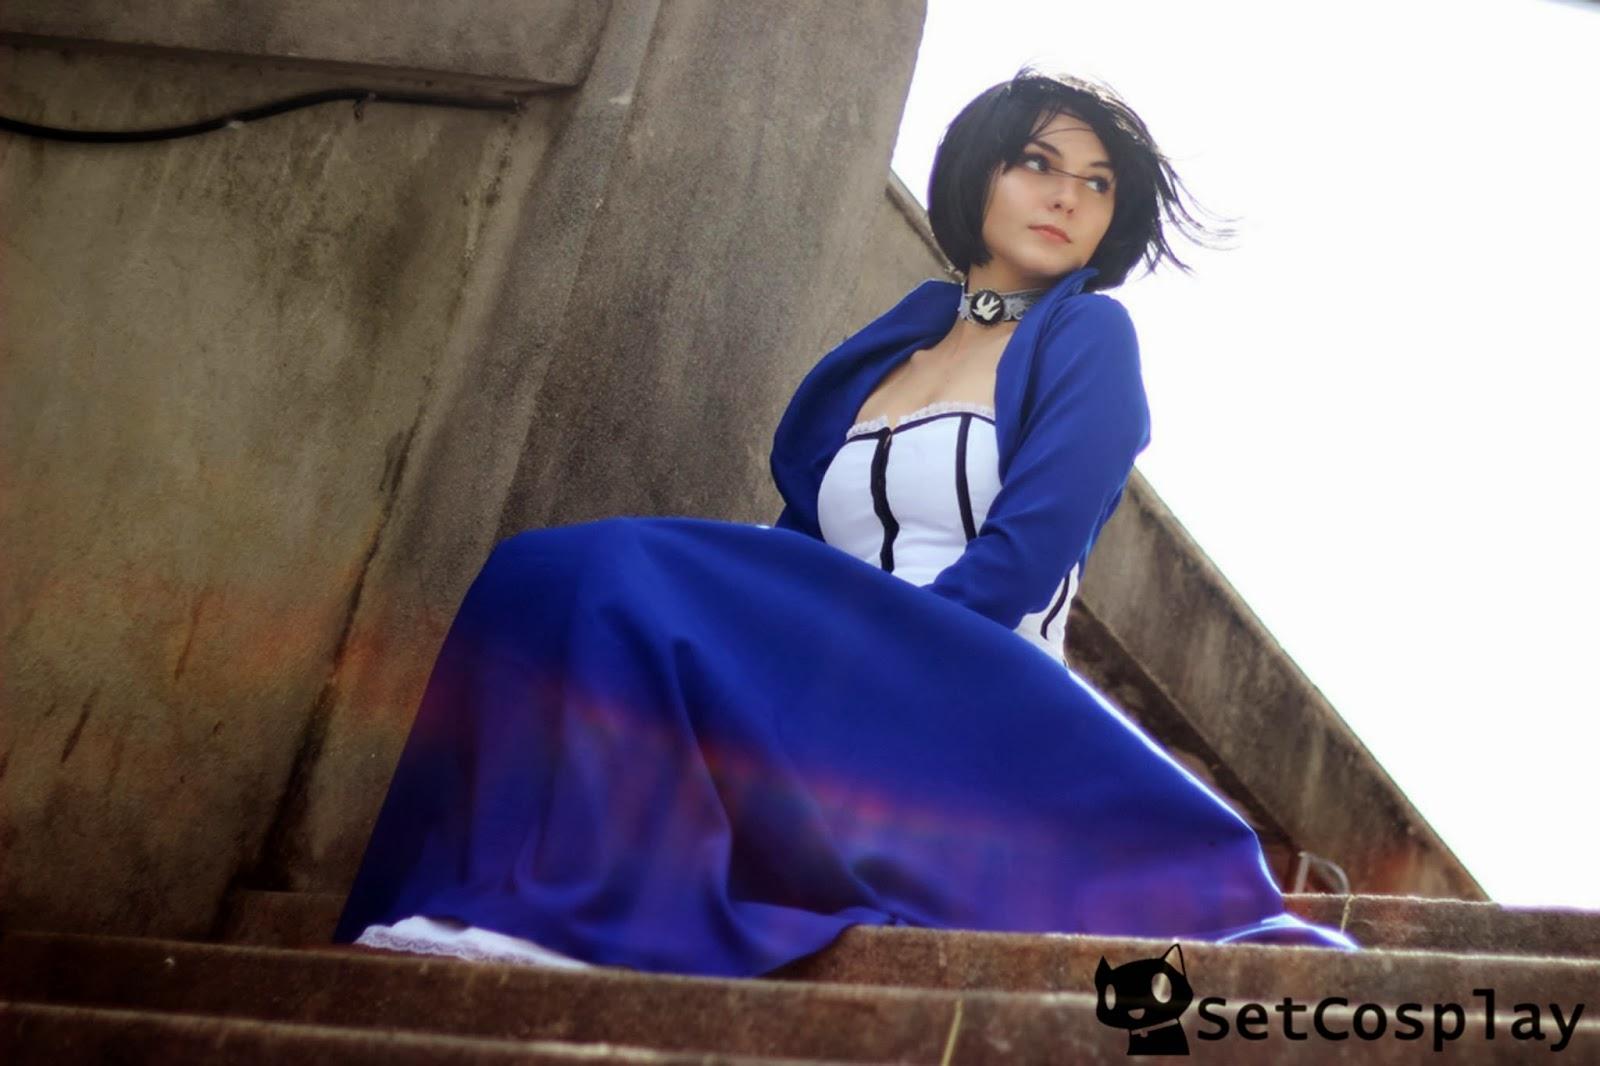 Elizabeth - Bioshock Infinite (Katiucha Barcelos)